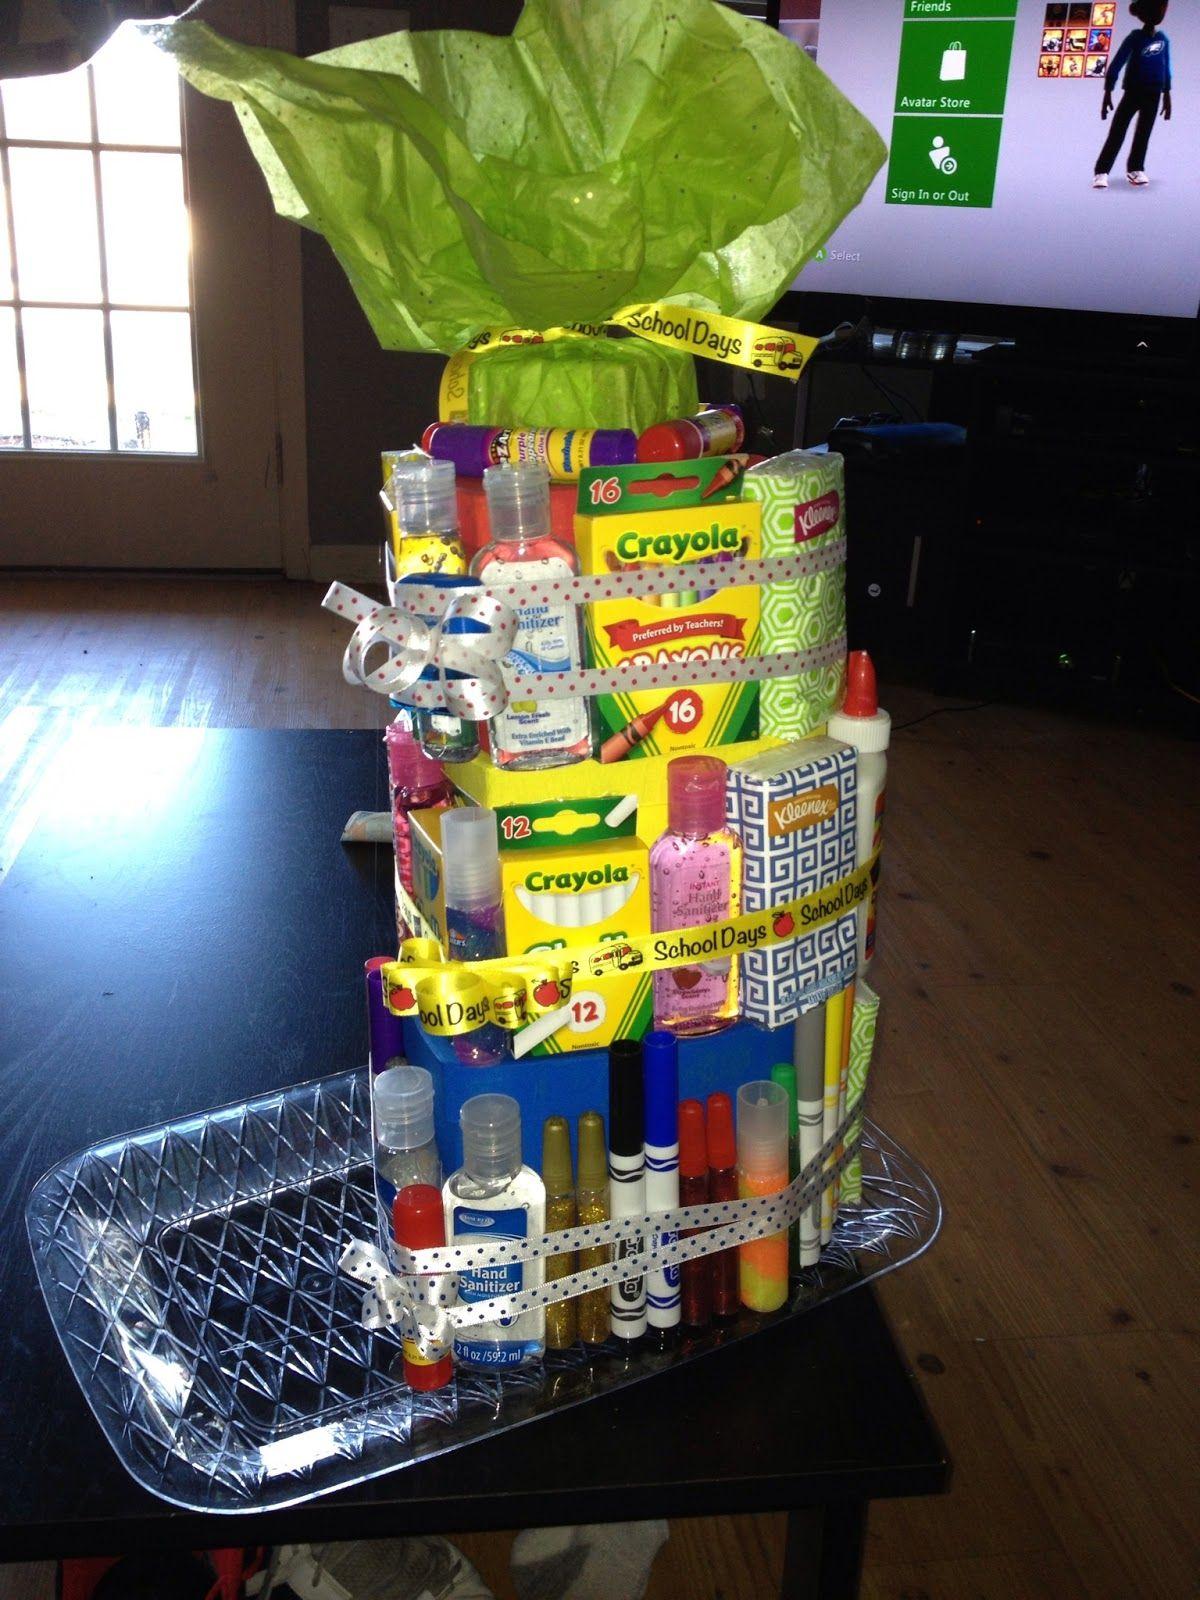 School Supply Basket School supplies, Basket, Diy crafts